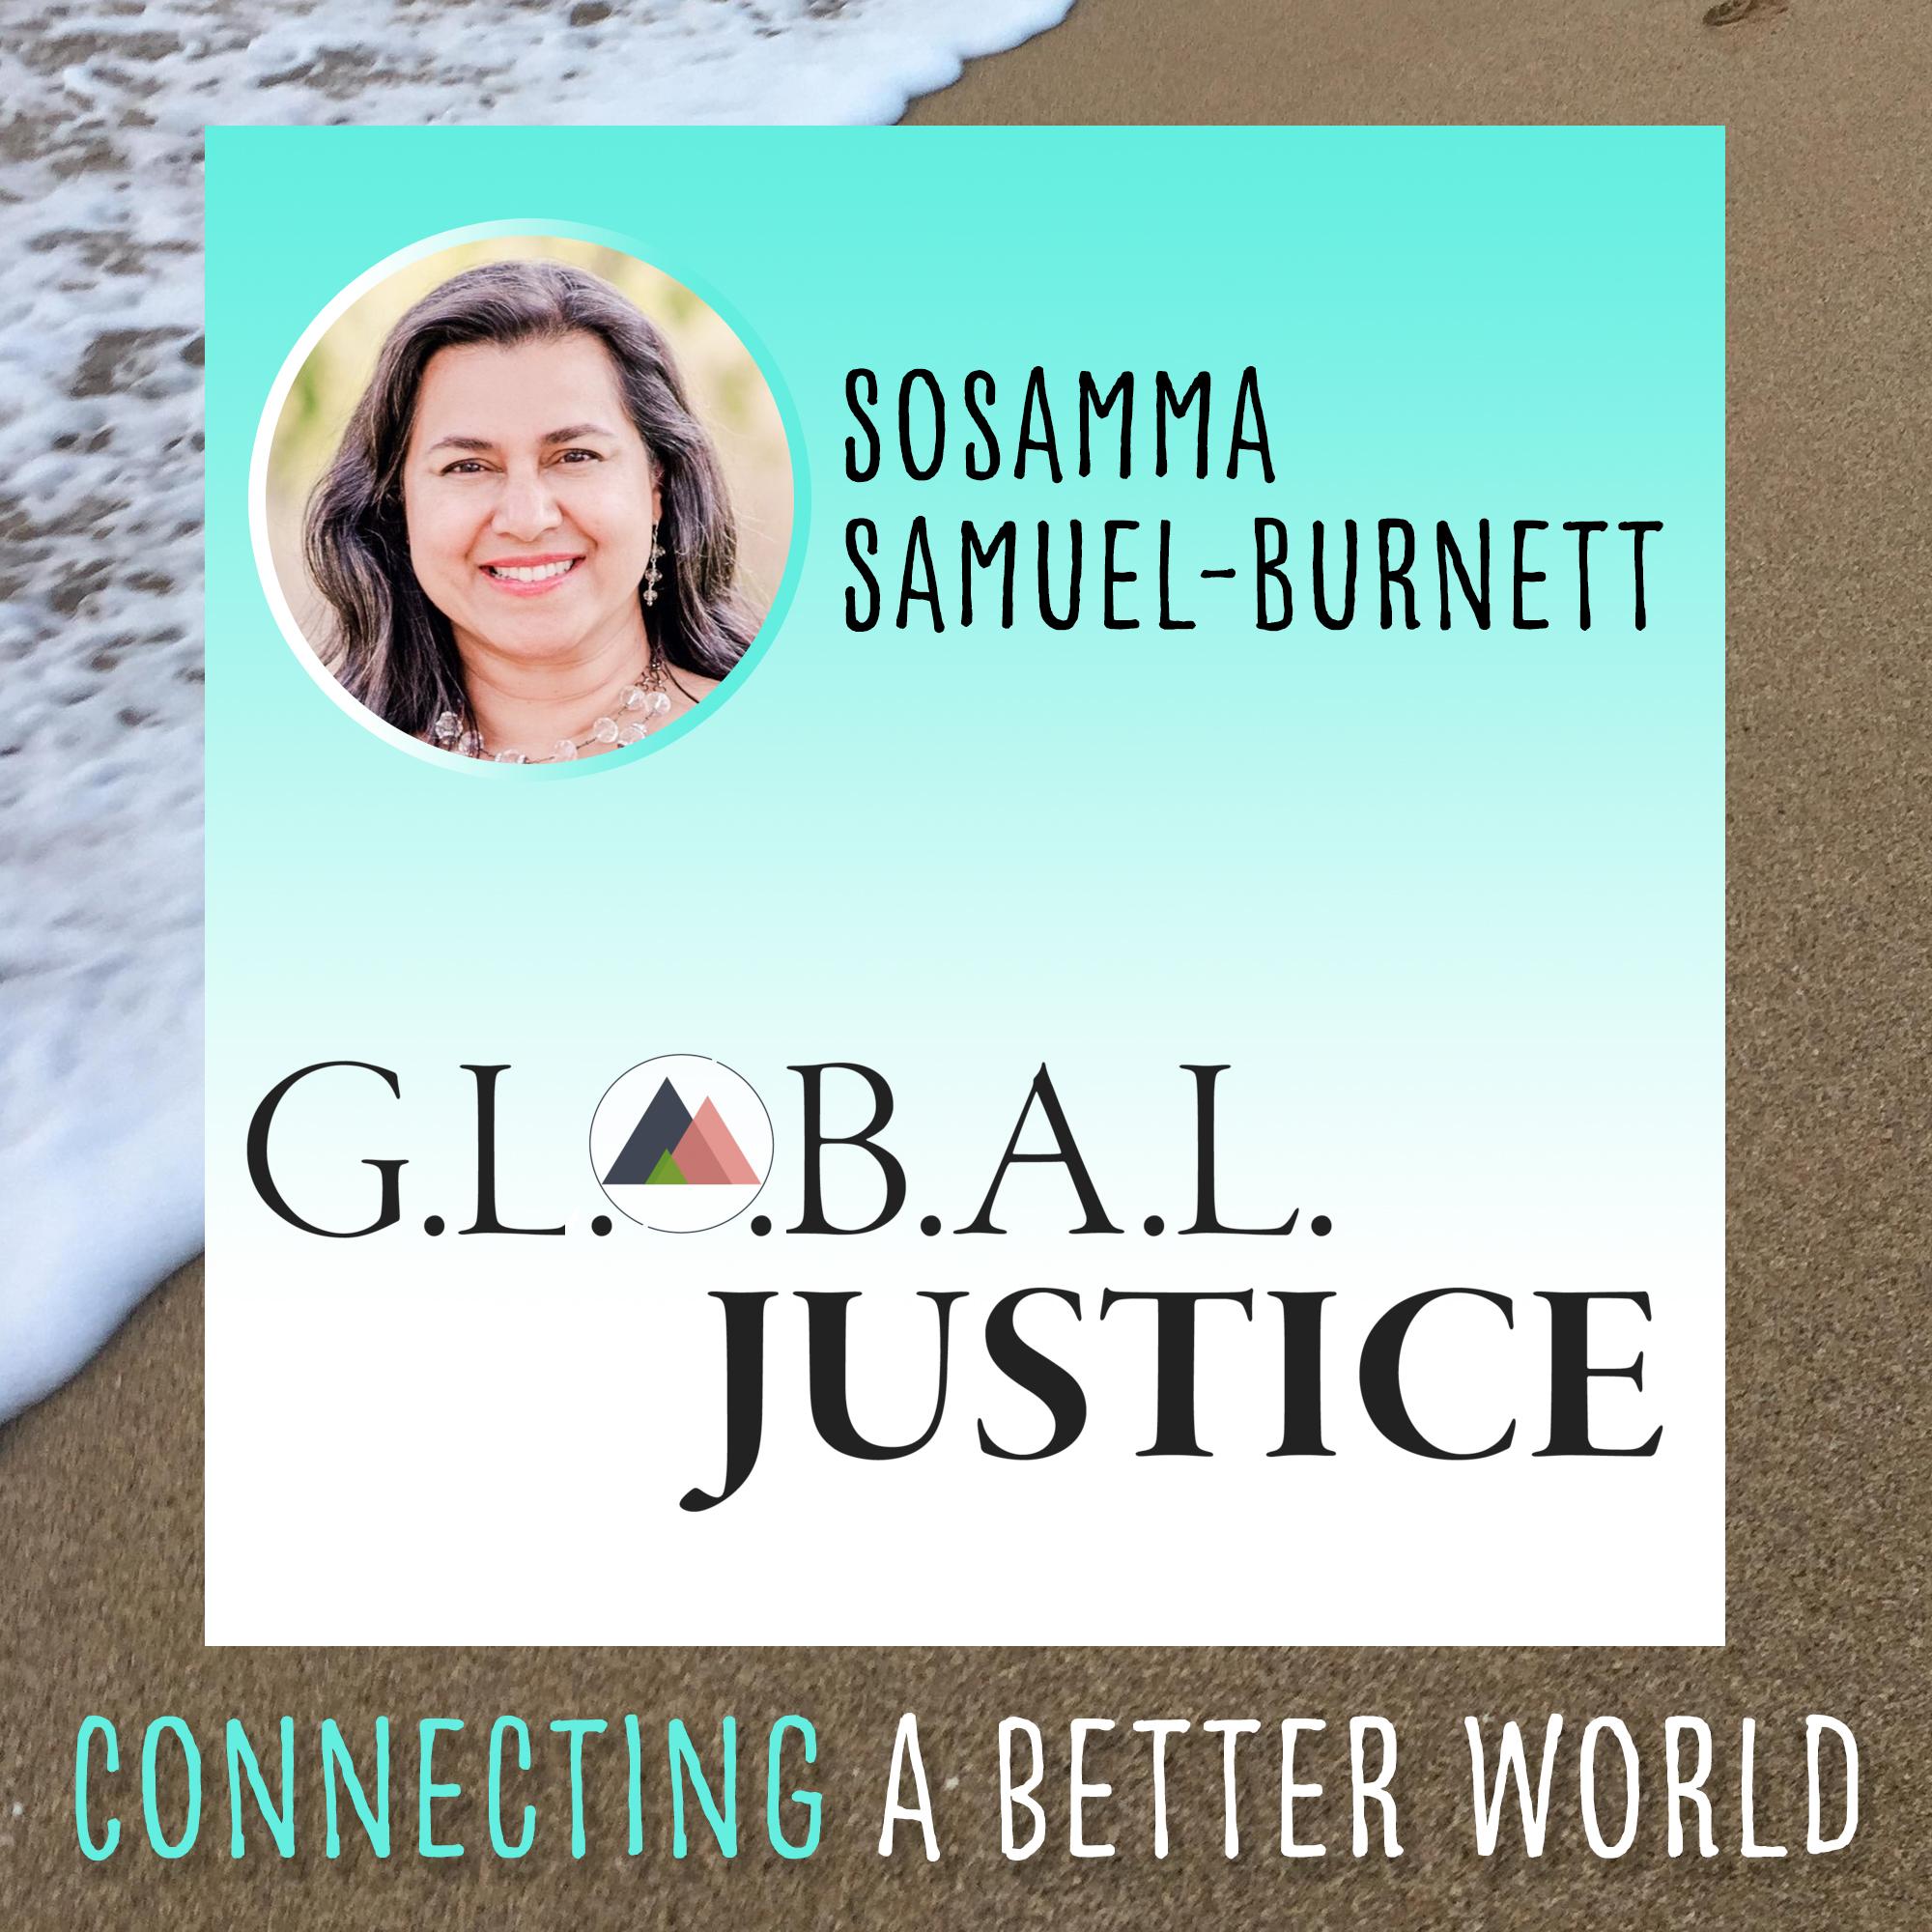 G.L.O.B.A.L. Justice with Sosamma Samuel-Burnett